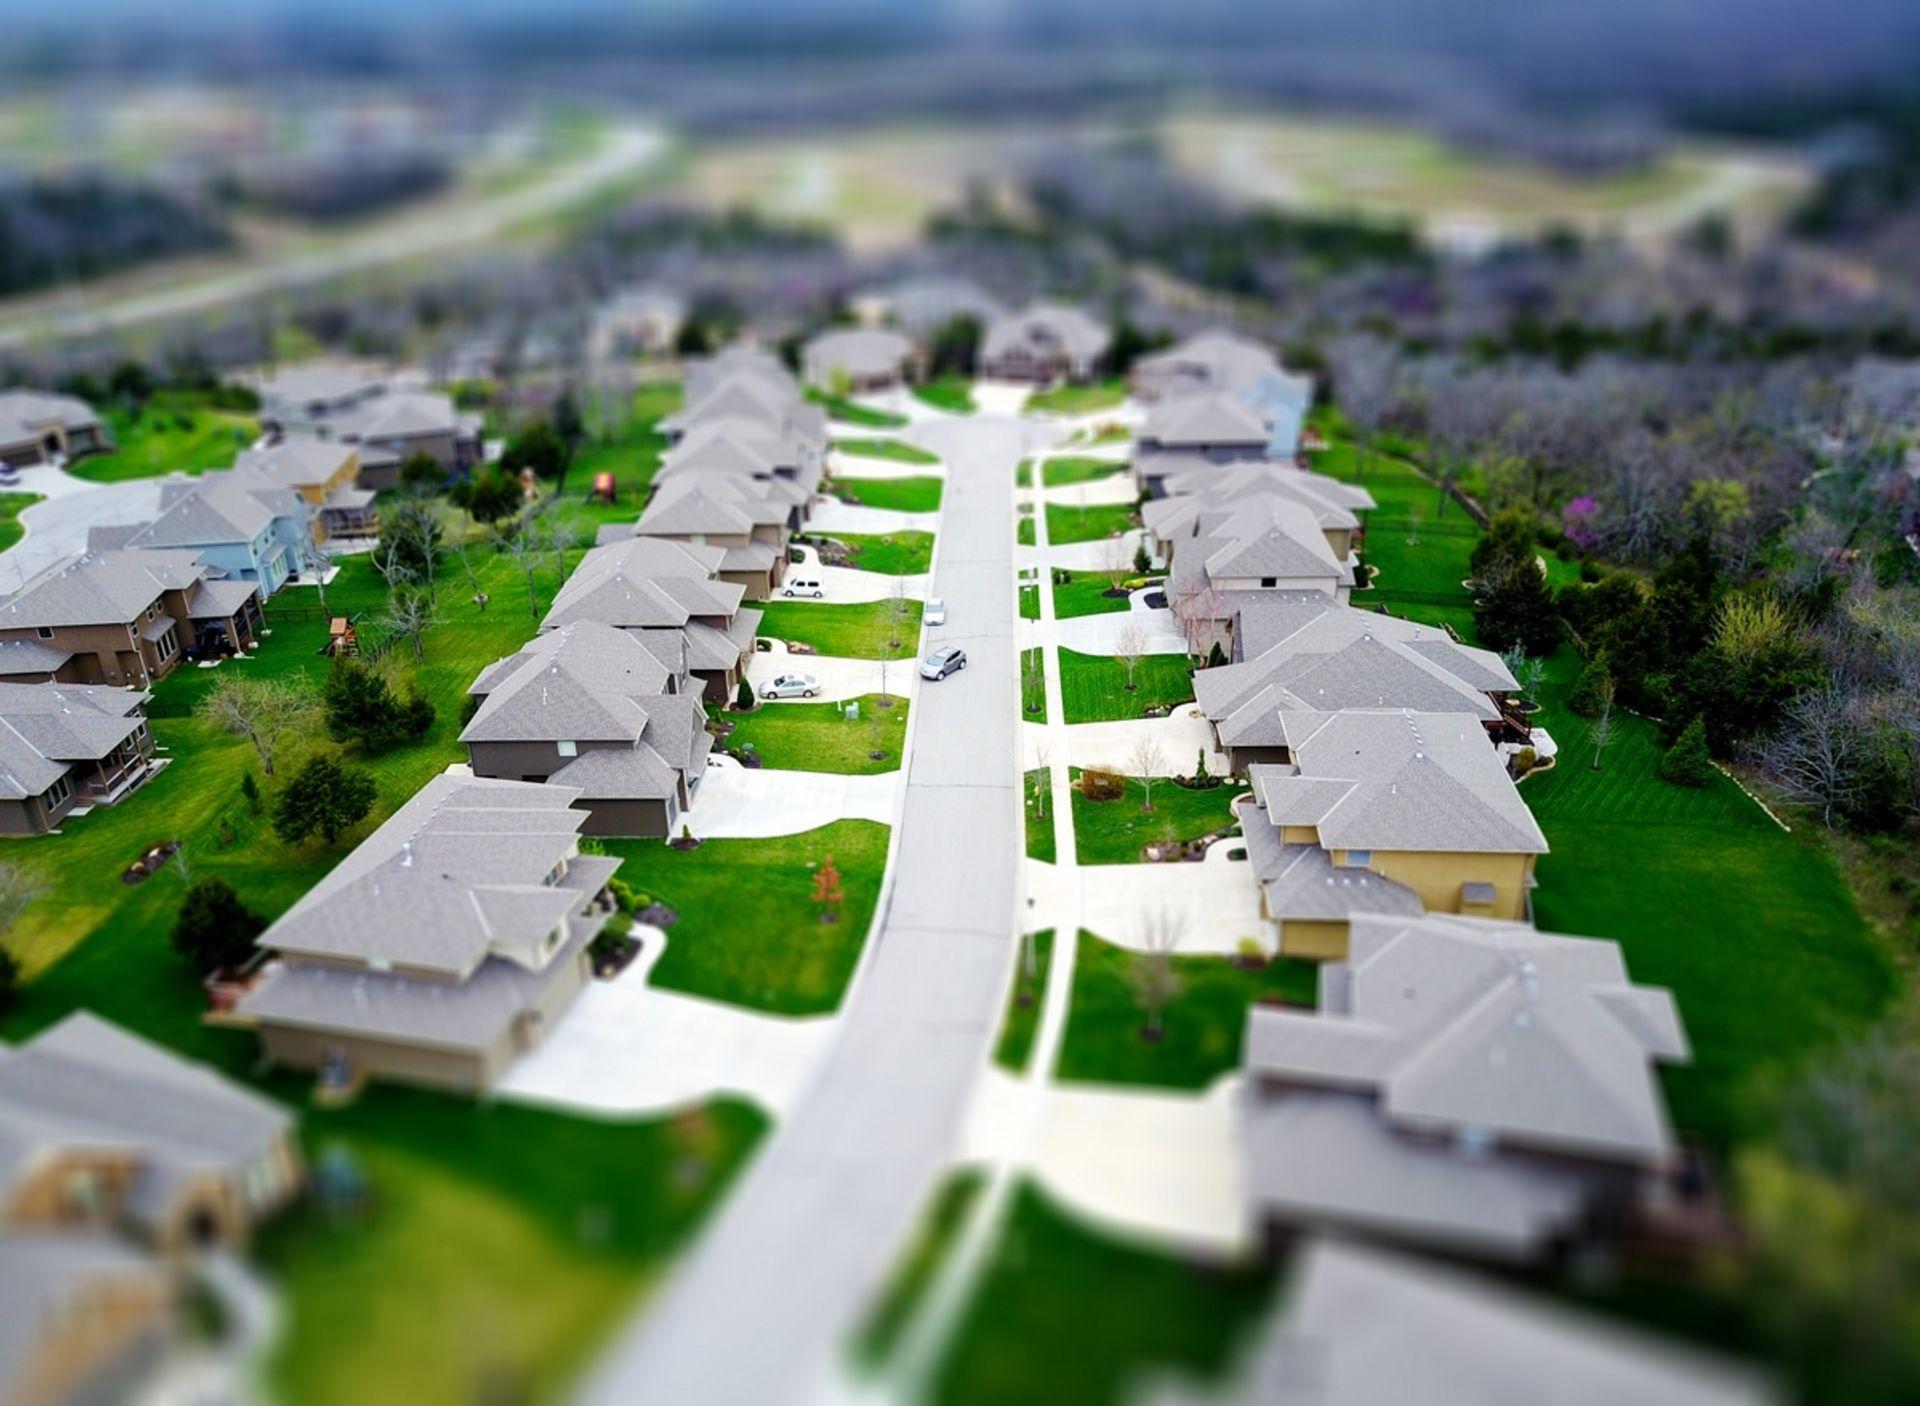 What's New in Your Neighborhood?